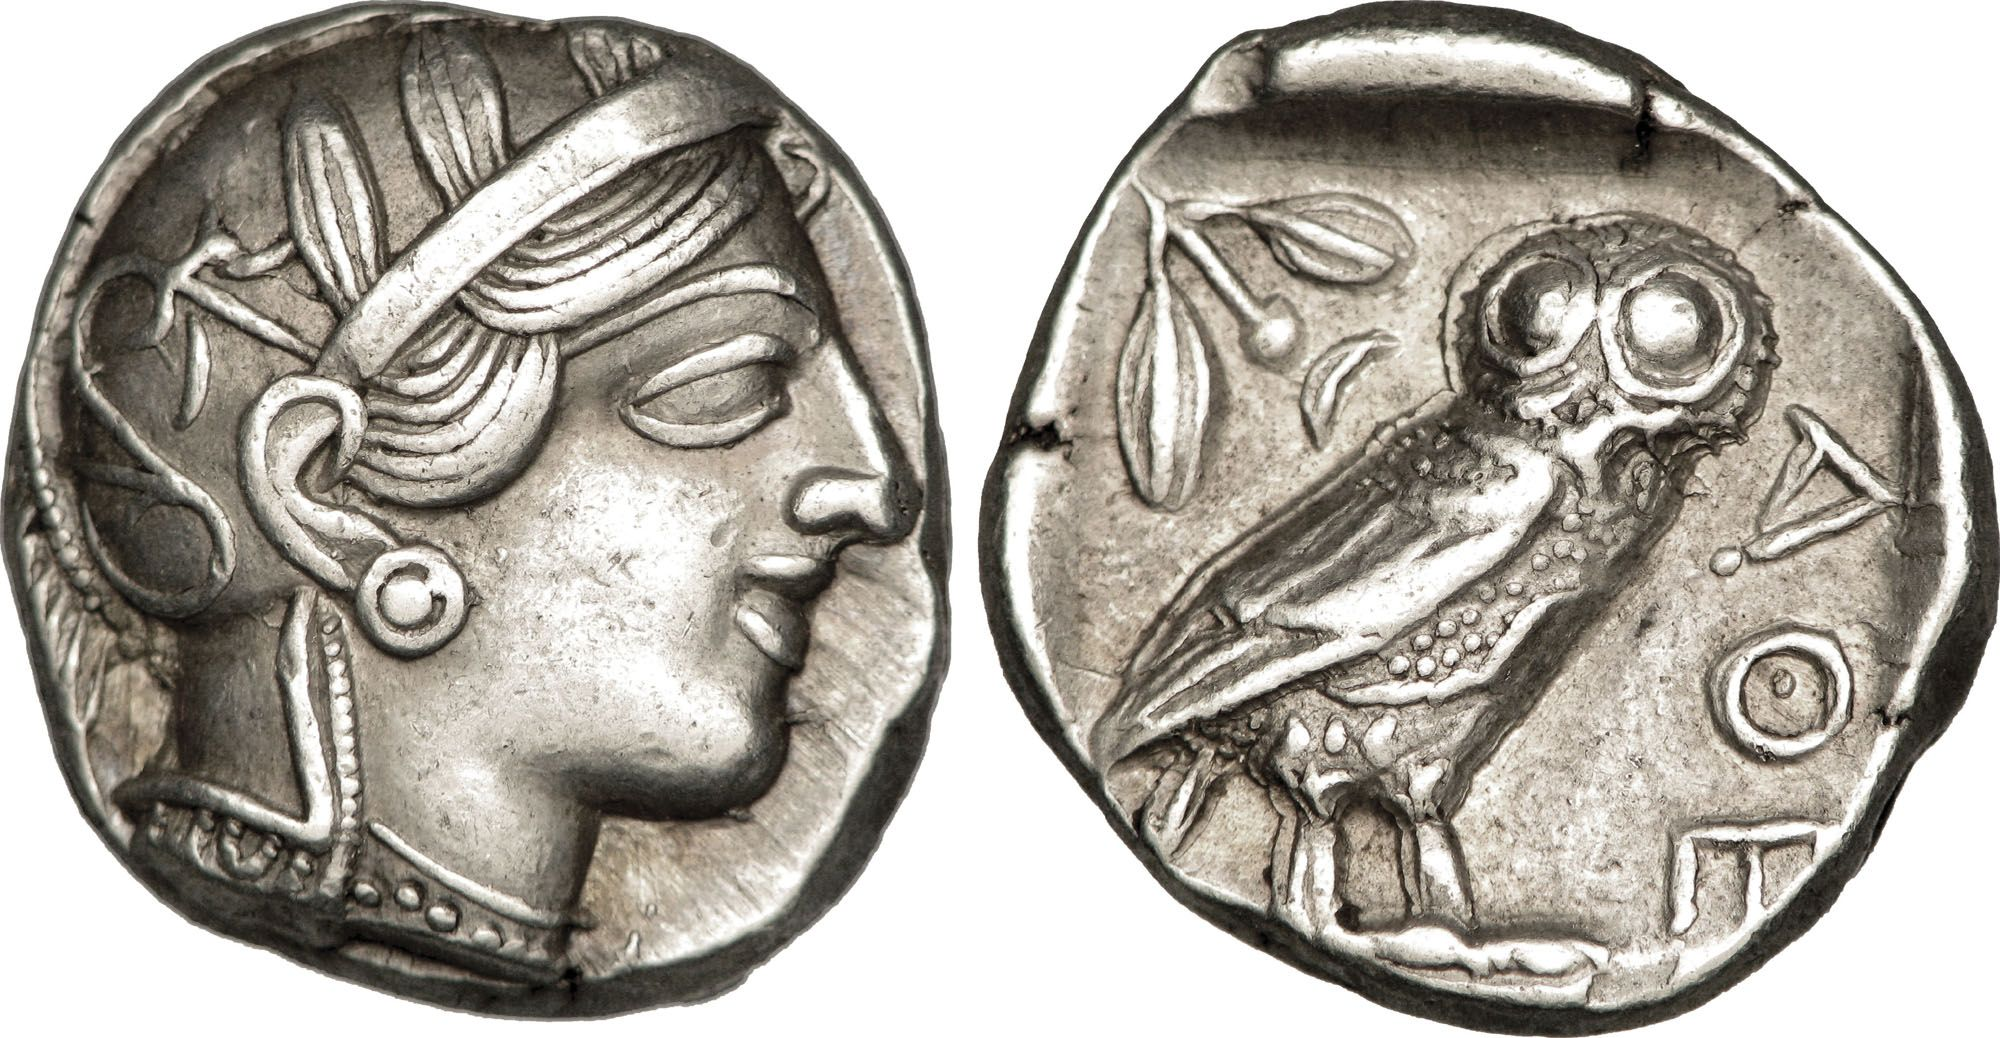 Pallas athena goddess of wisdom war ancient greek coin the pallas athena goddess of wisdom war ancient greek coin biocorpaavc